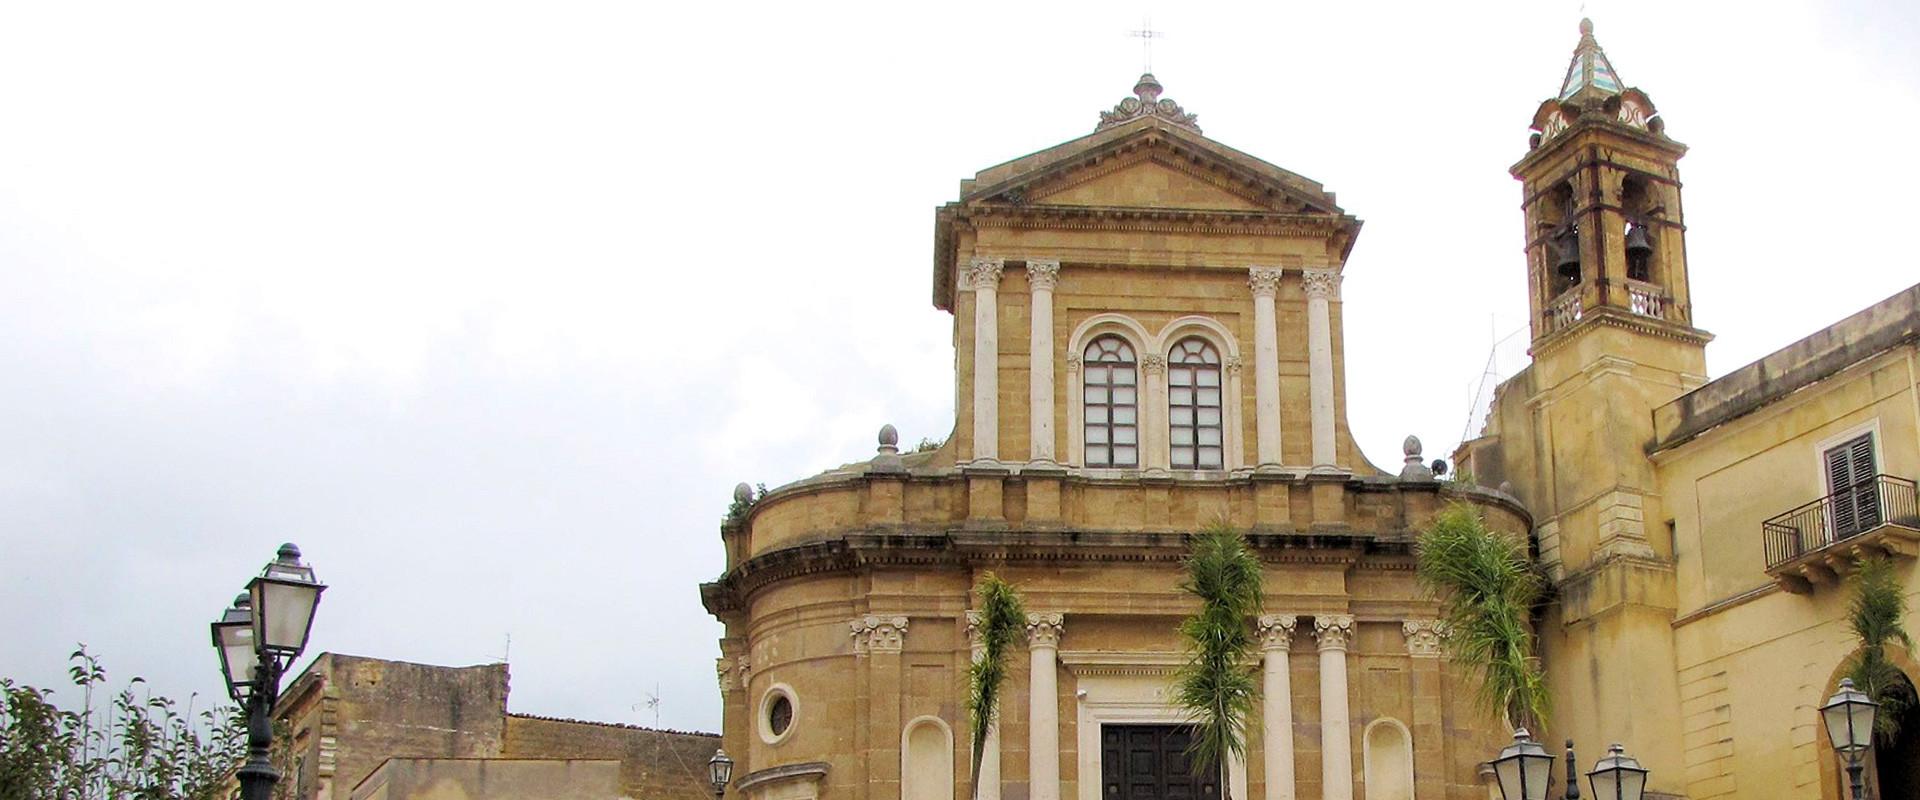 Santa Sicilia sambuca_pagine